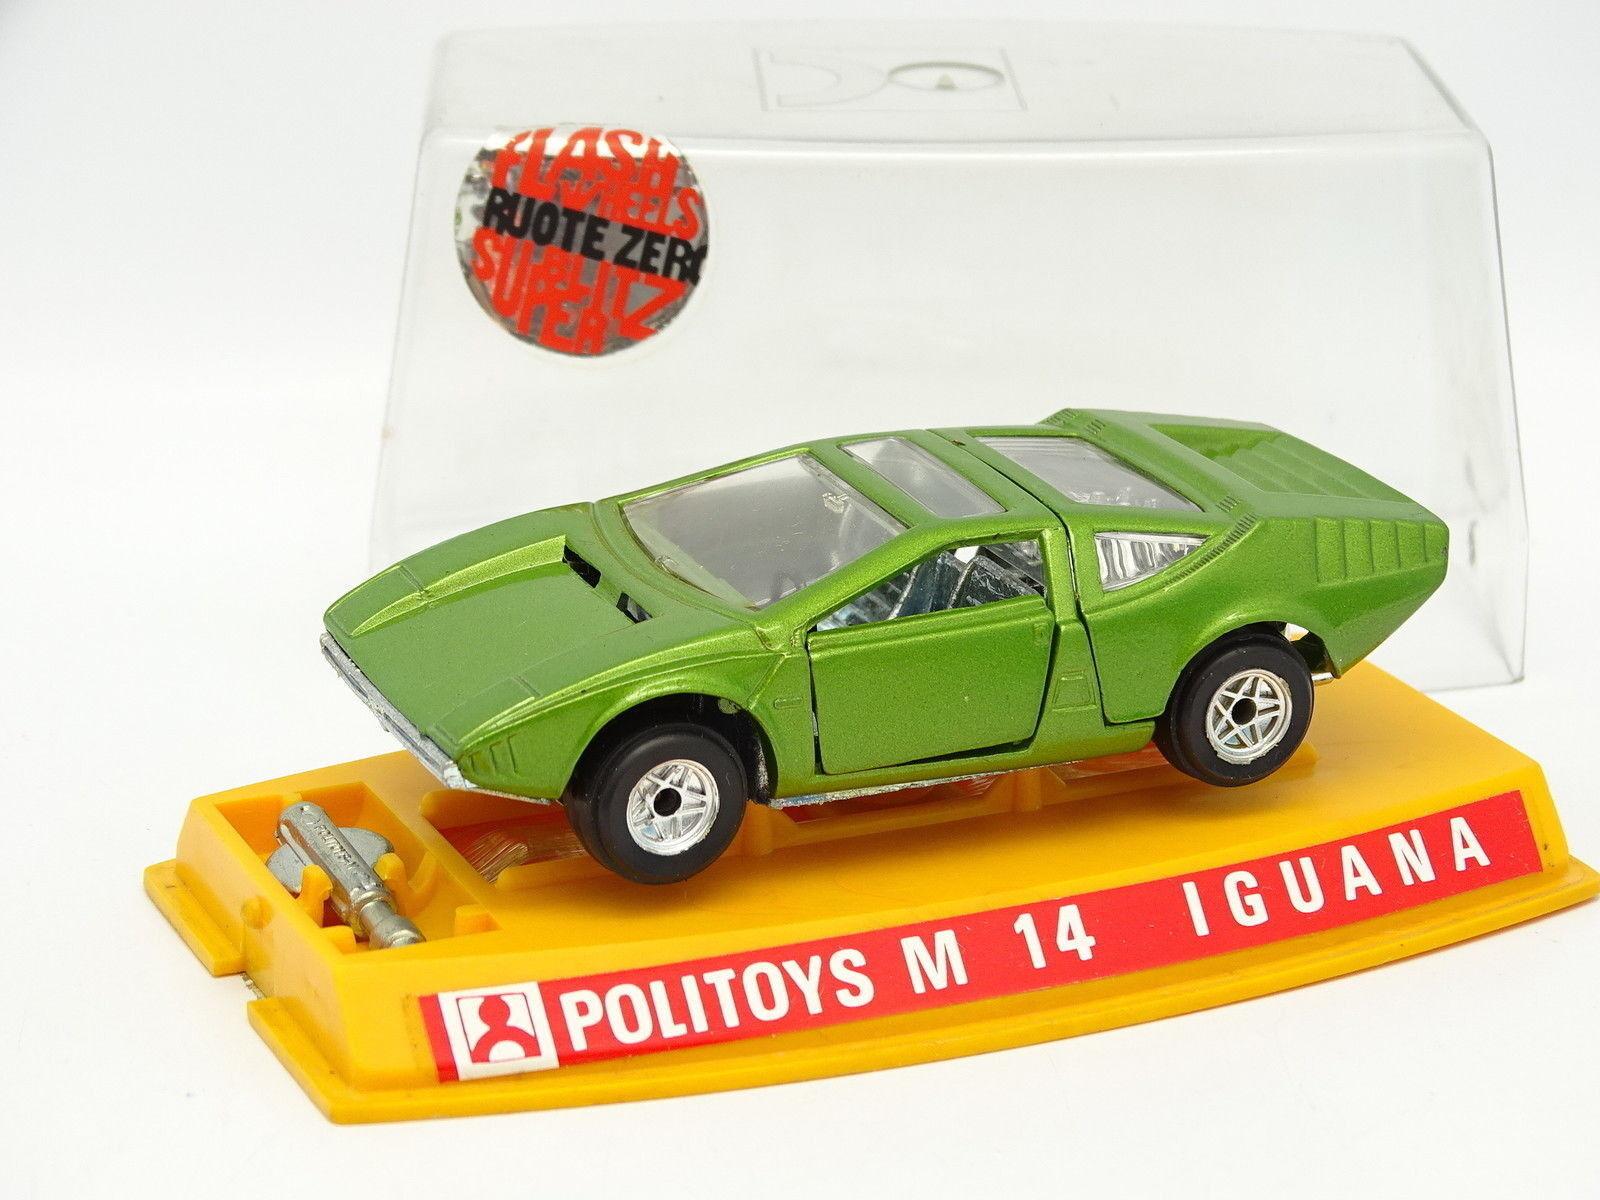 Politoys 1 43 - Alfa Romeo 33 Ital Diseño Iguana verde M14